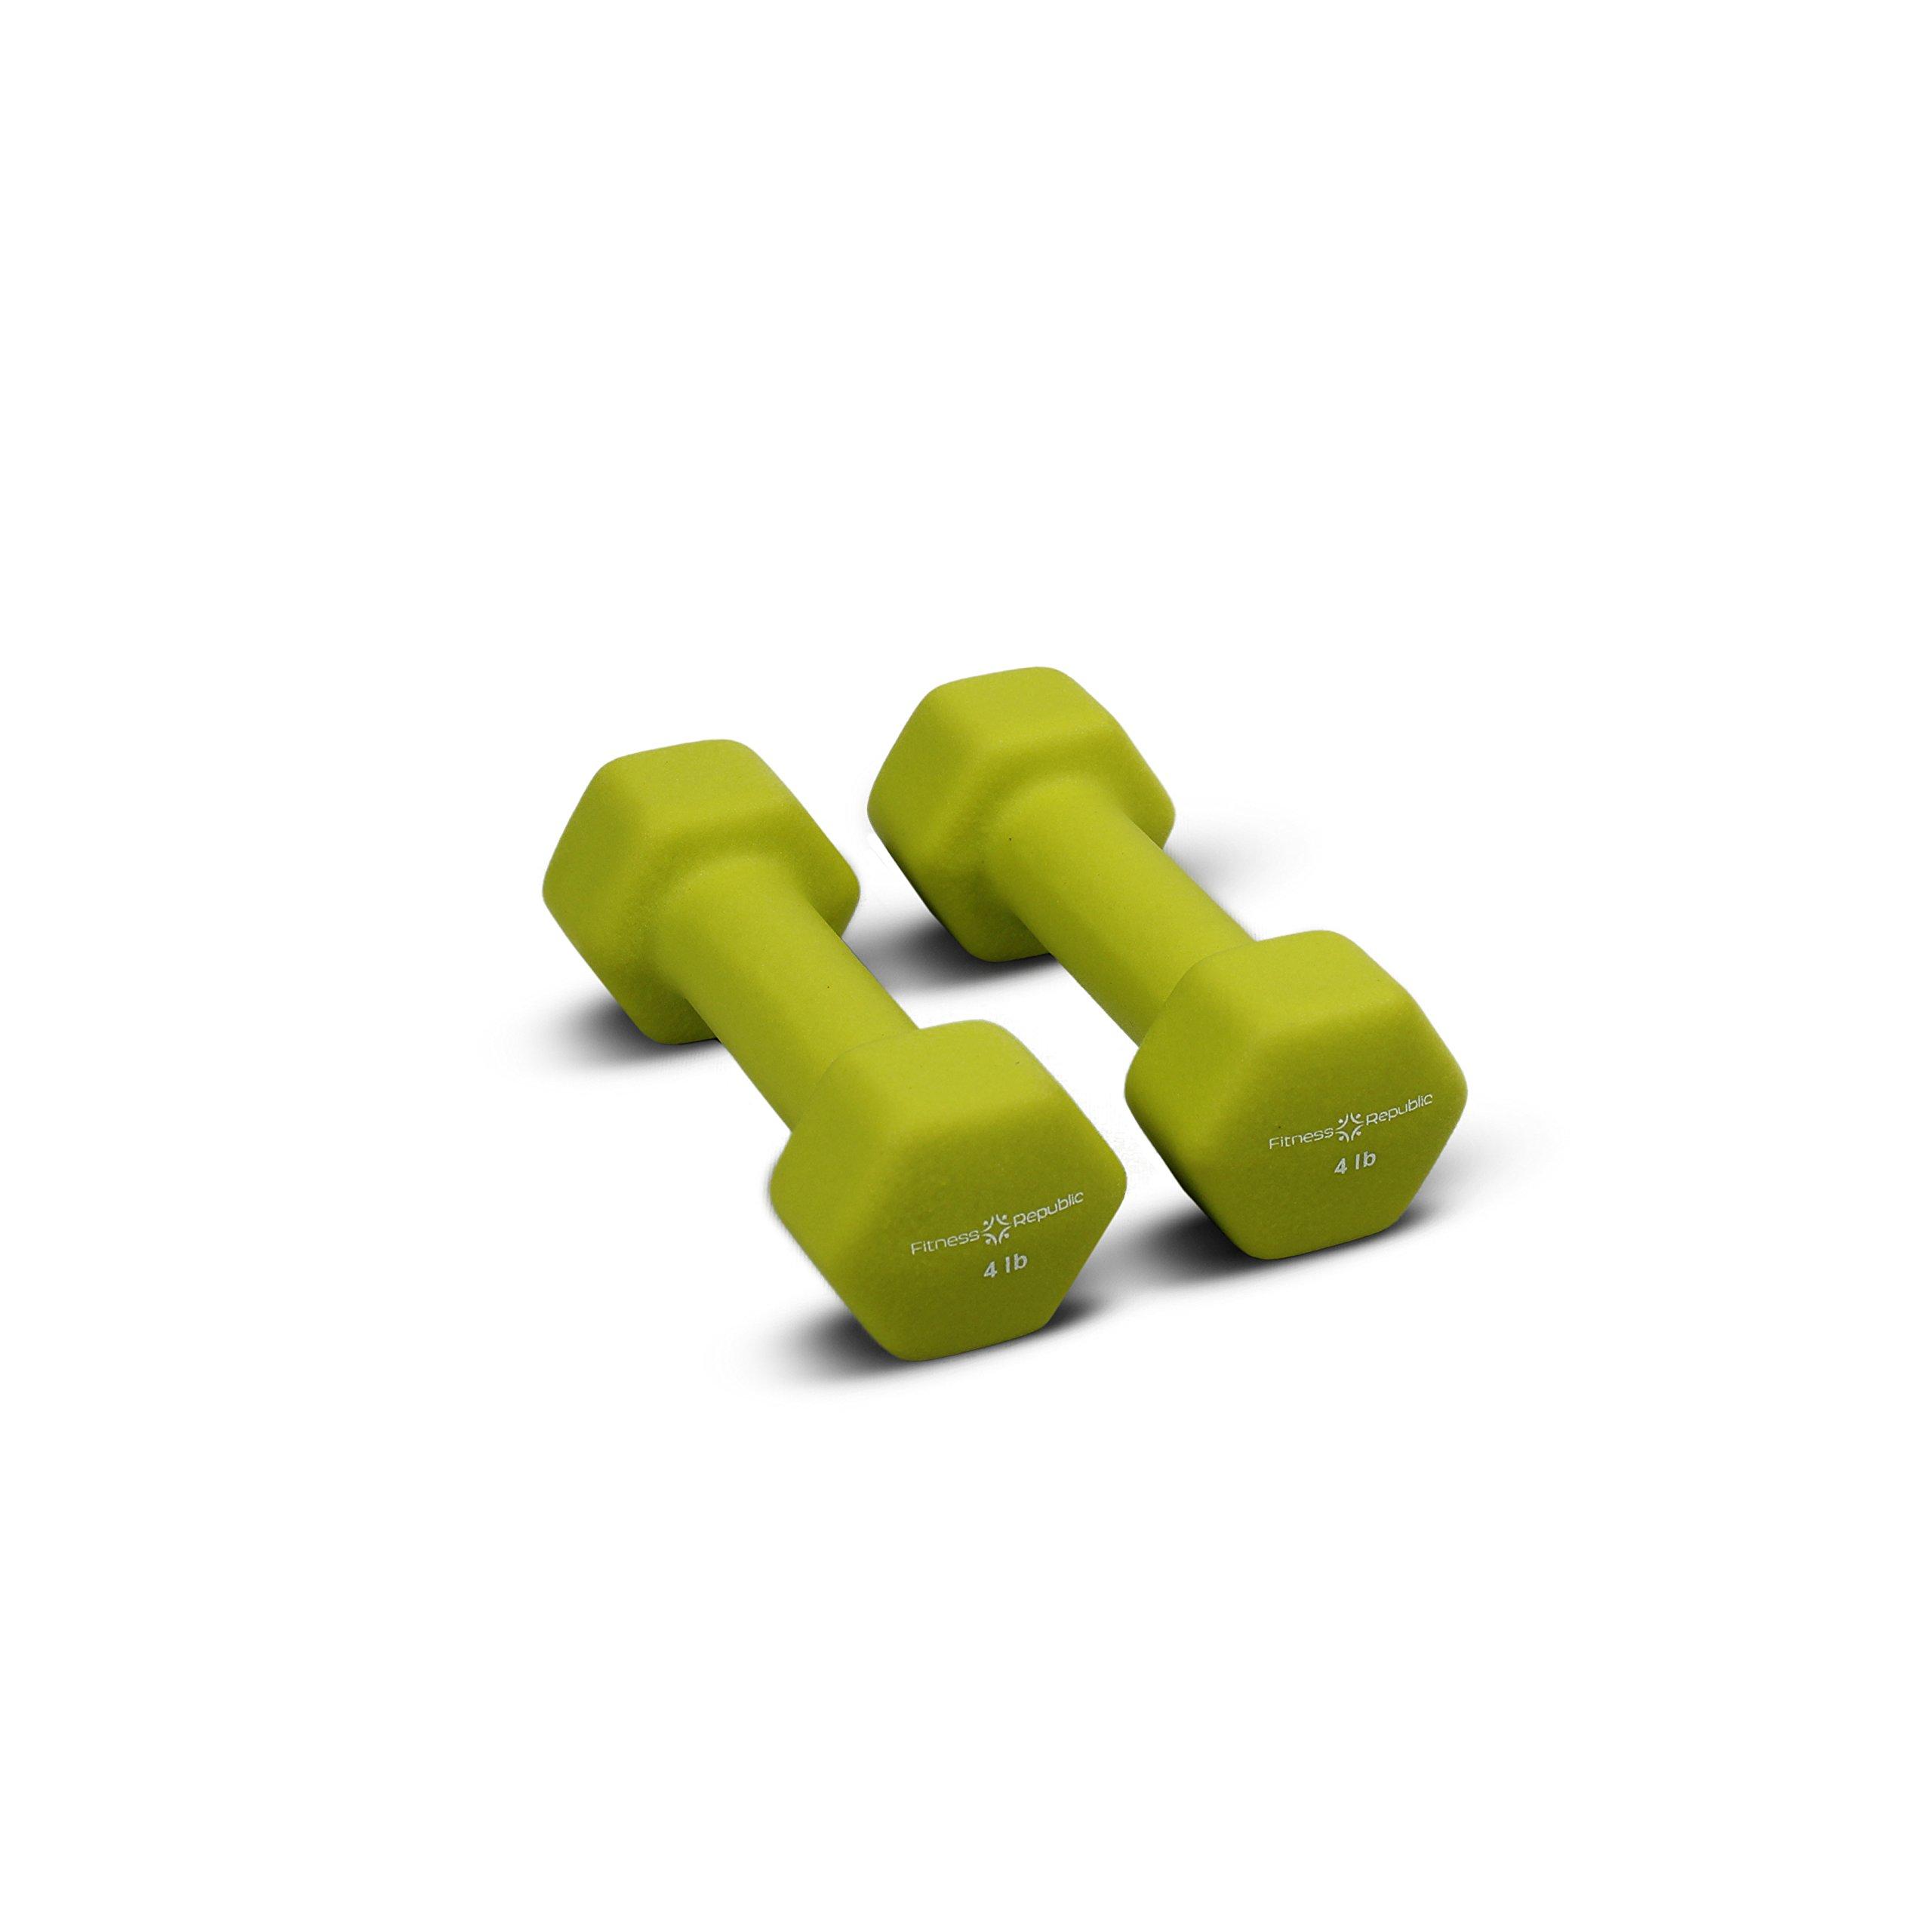 Fitness Republic Neoprene Dumbbells 4 lbs Set (Neoprene Weights)